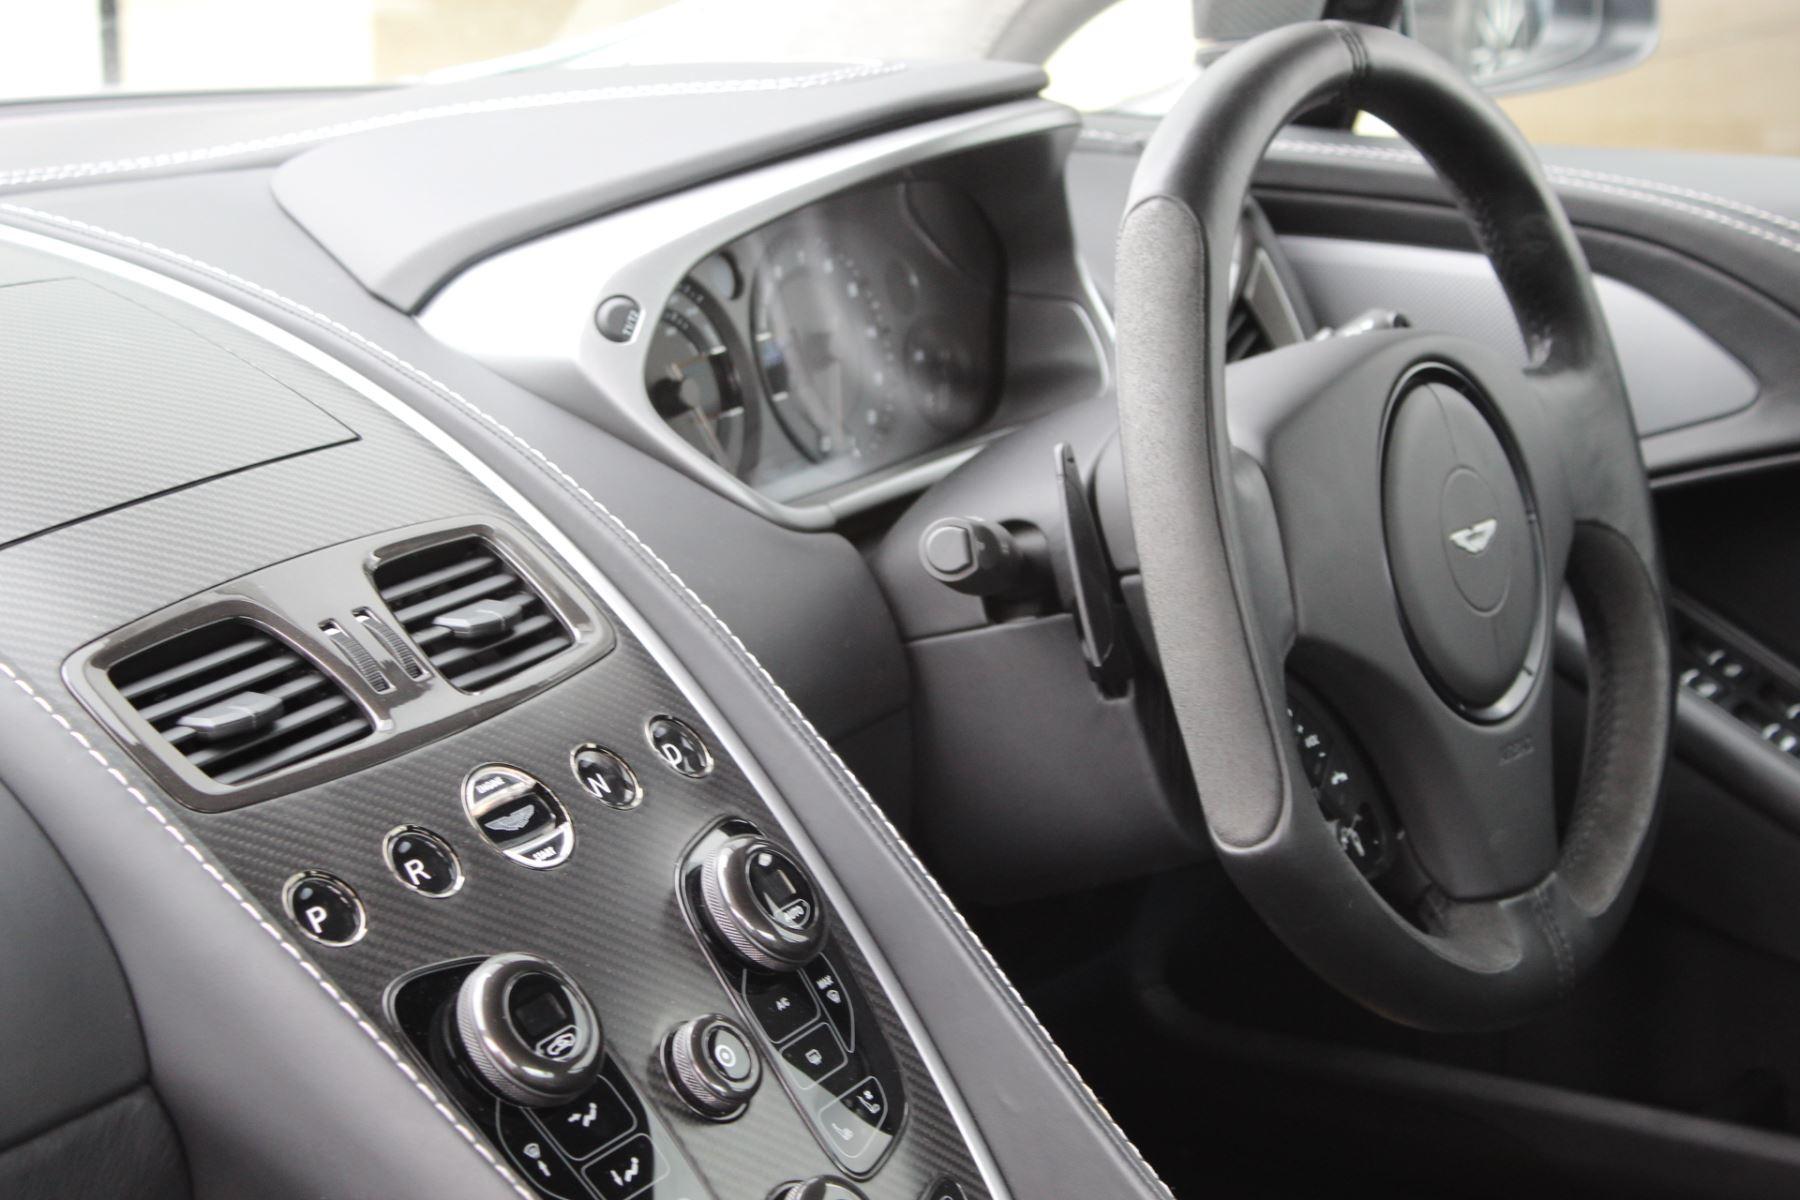 Aston Martin Vanquish V12 2+2 2dr Touchtronic image 6